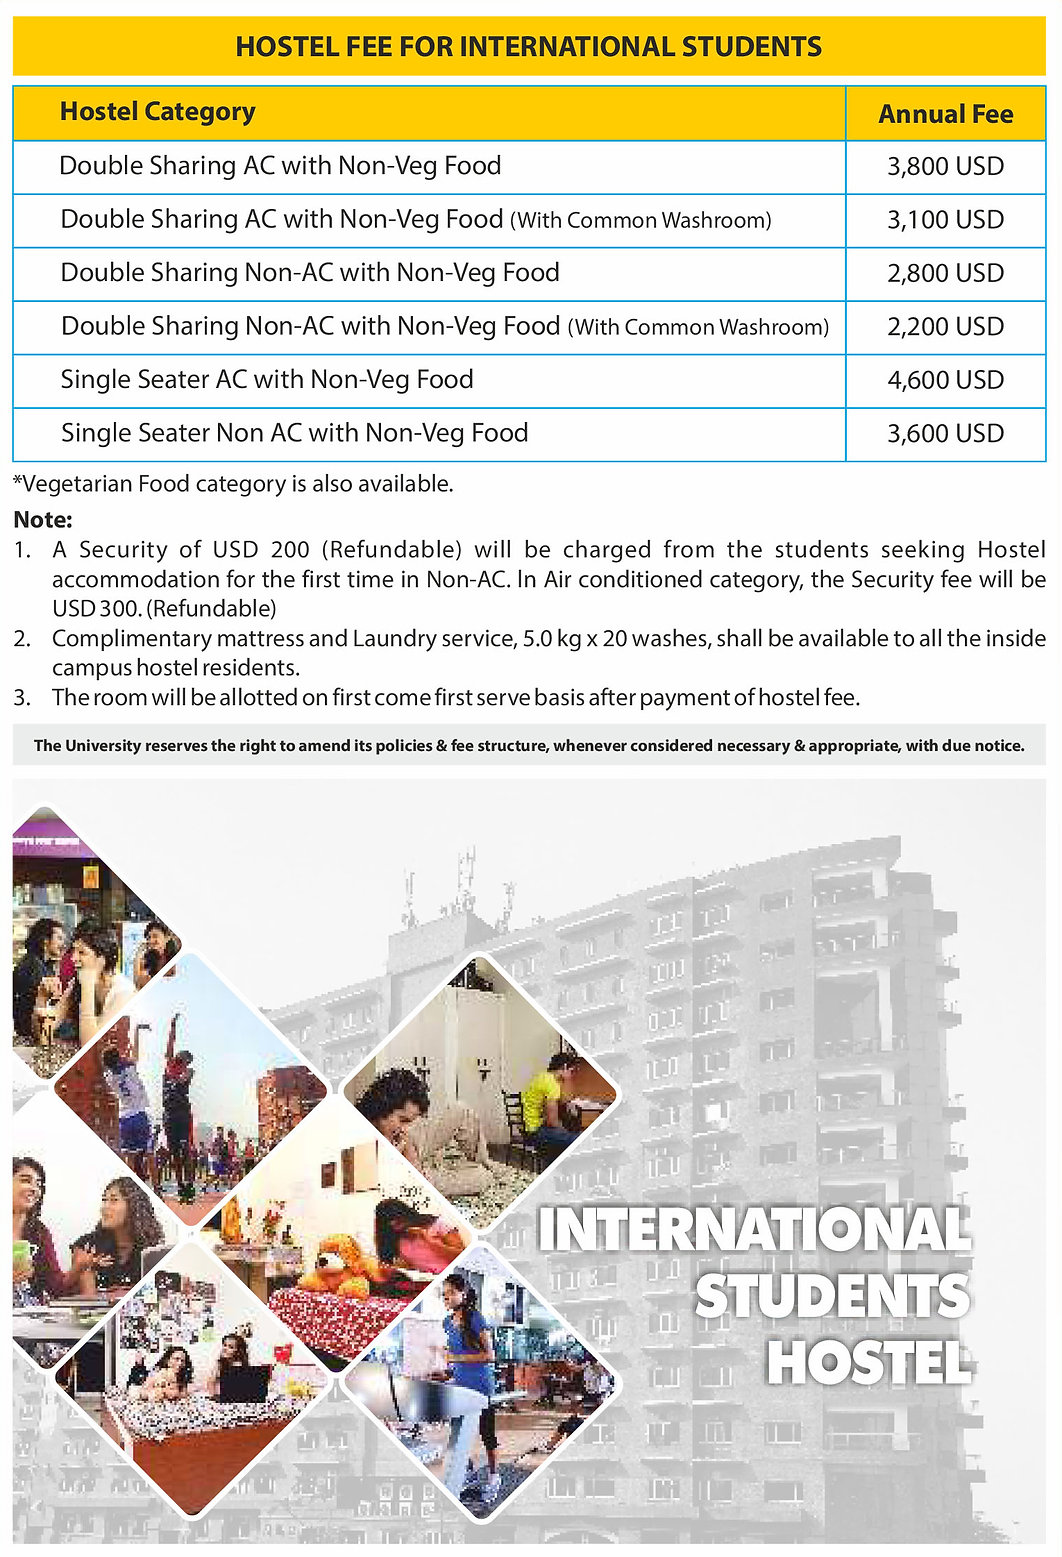 USD Fee Flyer-10007 02.jpg